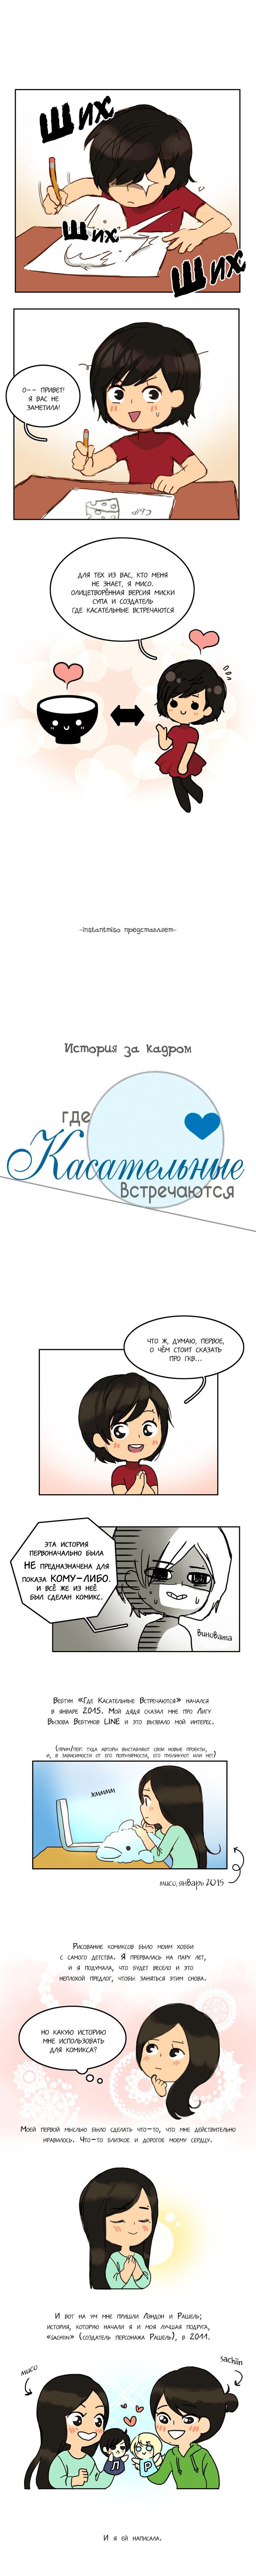 https://r1.mangarussia.com/comics/pic2/21/22485/283876/1454652589246.jpg Page 1